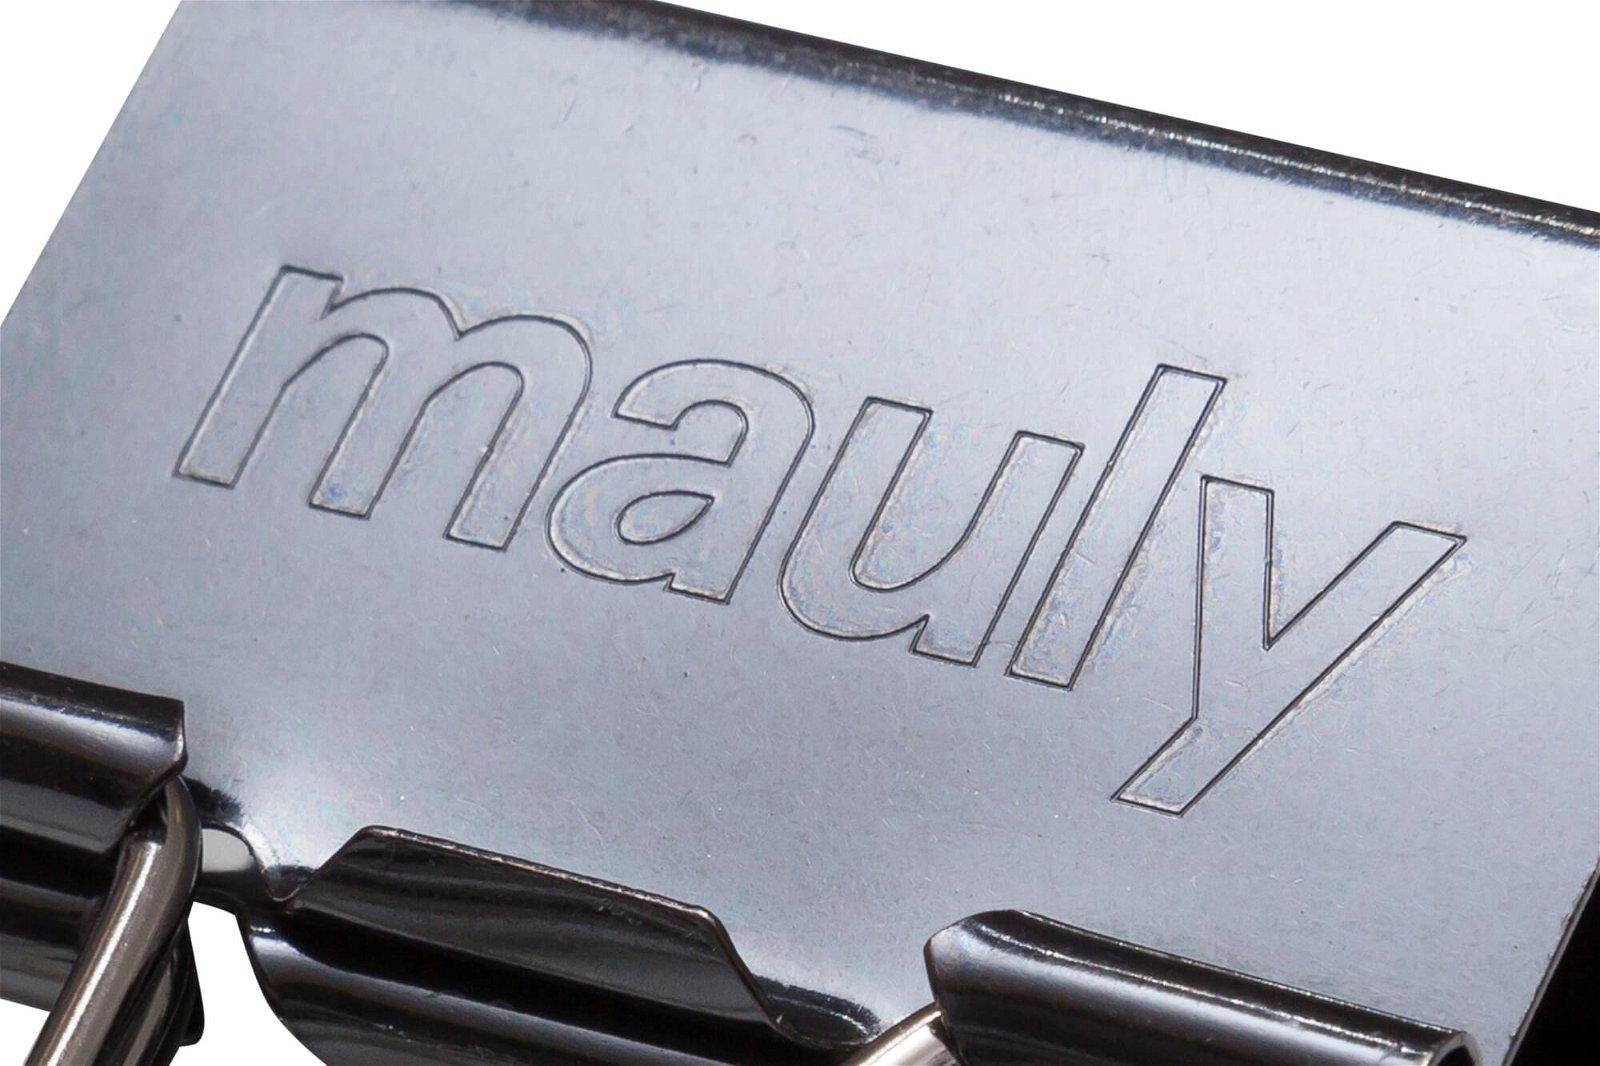 mauly 215, Breite 41 mm, 6 St./Btl., schwarz